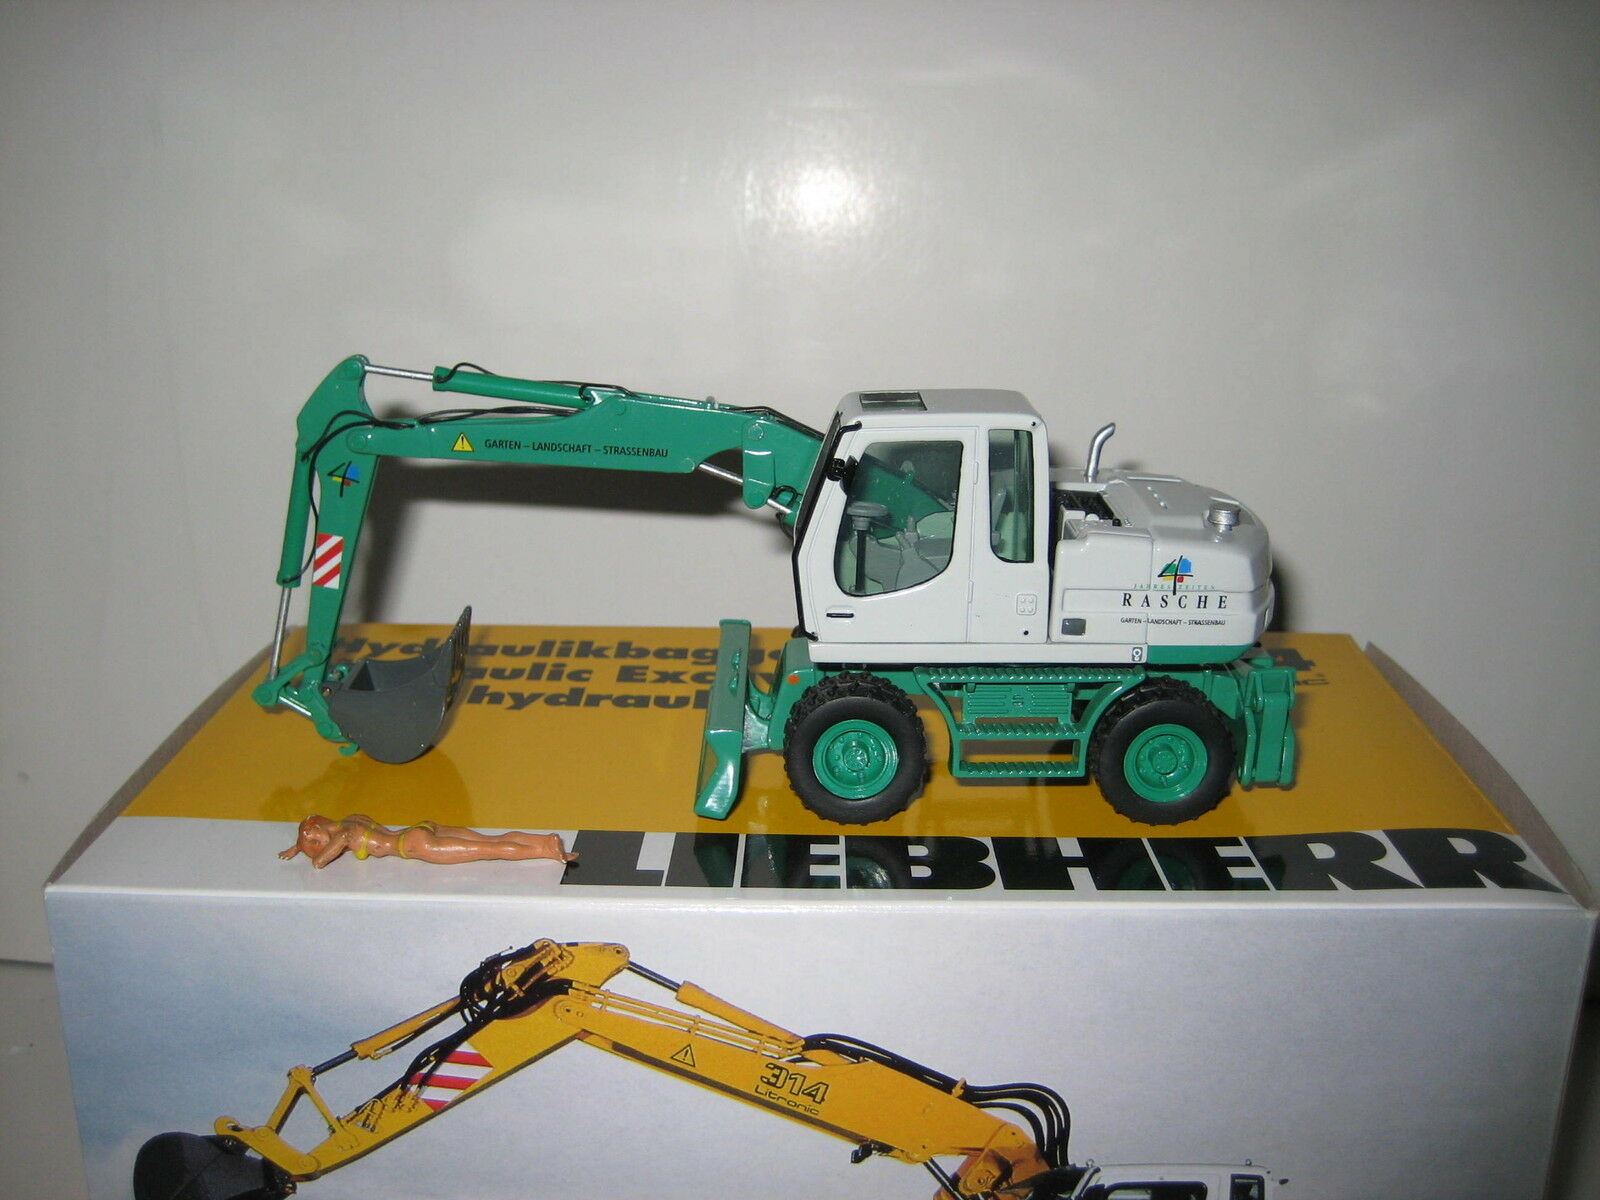 Liebherr A 314 Excavateurs tieflöffel rapide  498 NZG 1 50 neuf dans sa boîte